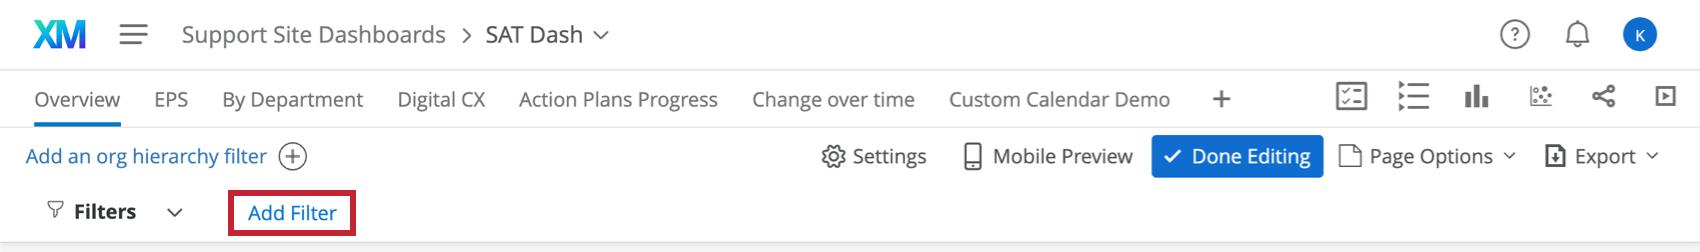 Add Filter button